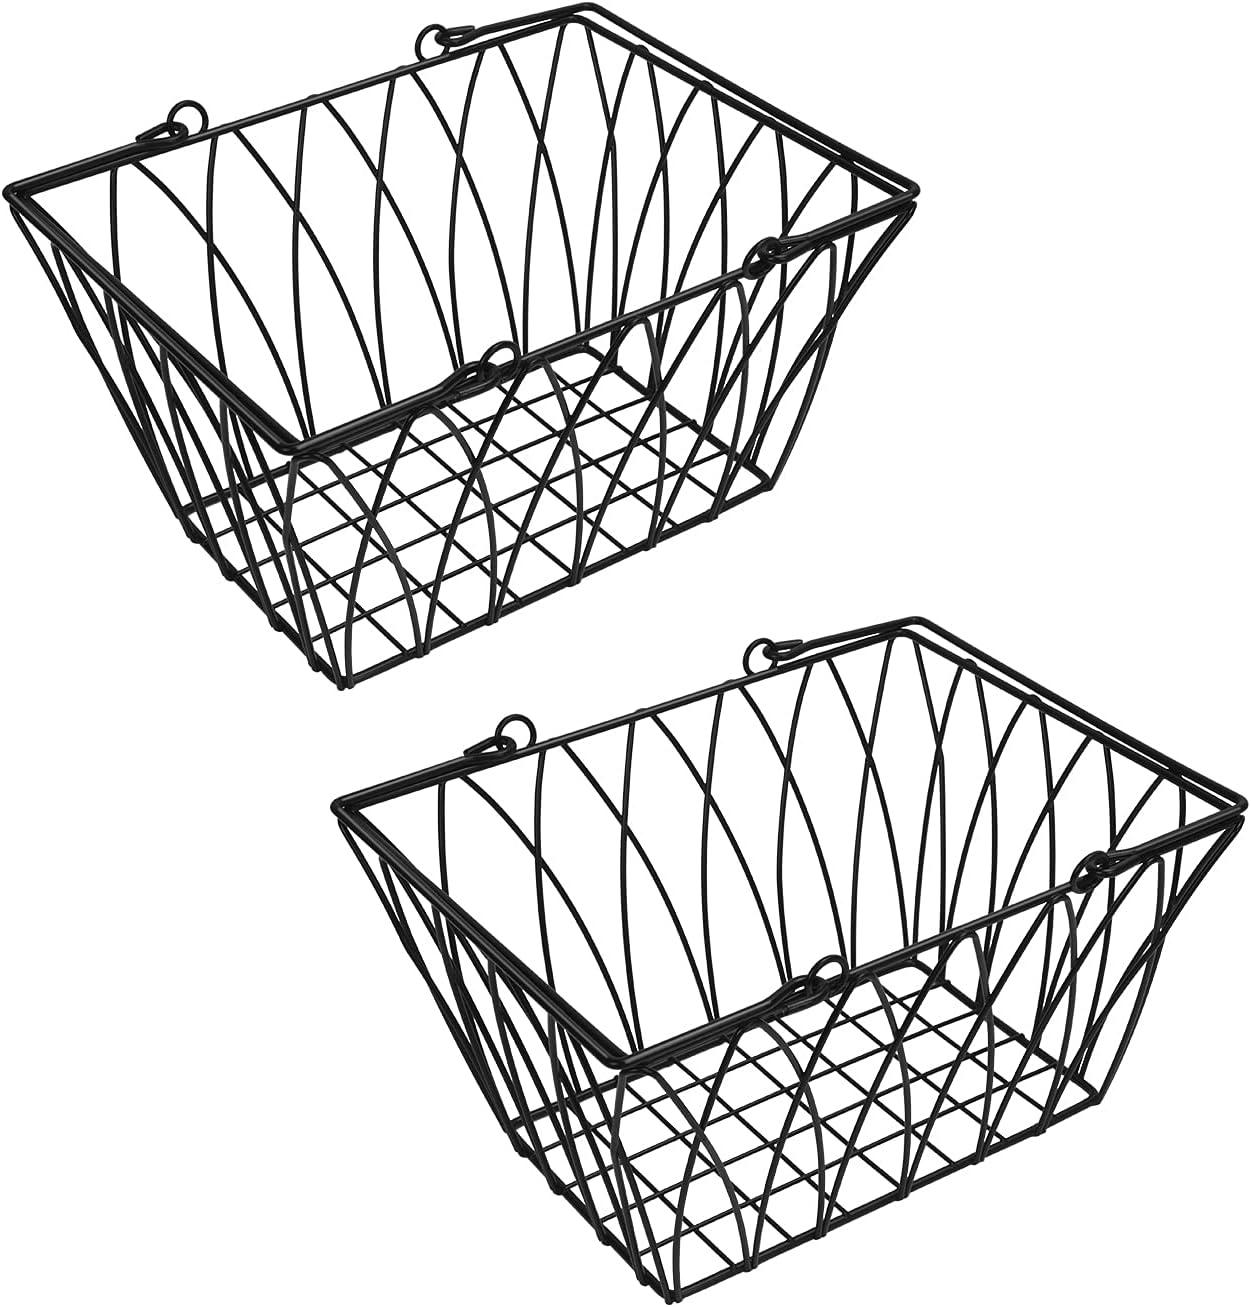 2 Pcs Wire Storage Basket, Yaenoei Metal Storage Basket with Handles, Farmhouse Decor Storage Organizer Bin Household Food Baskets for Closets, Pantry, Shelf, Kitchen, Bathroom, Garage